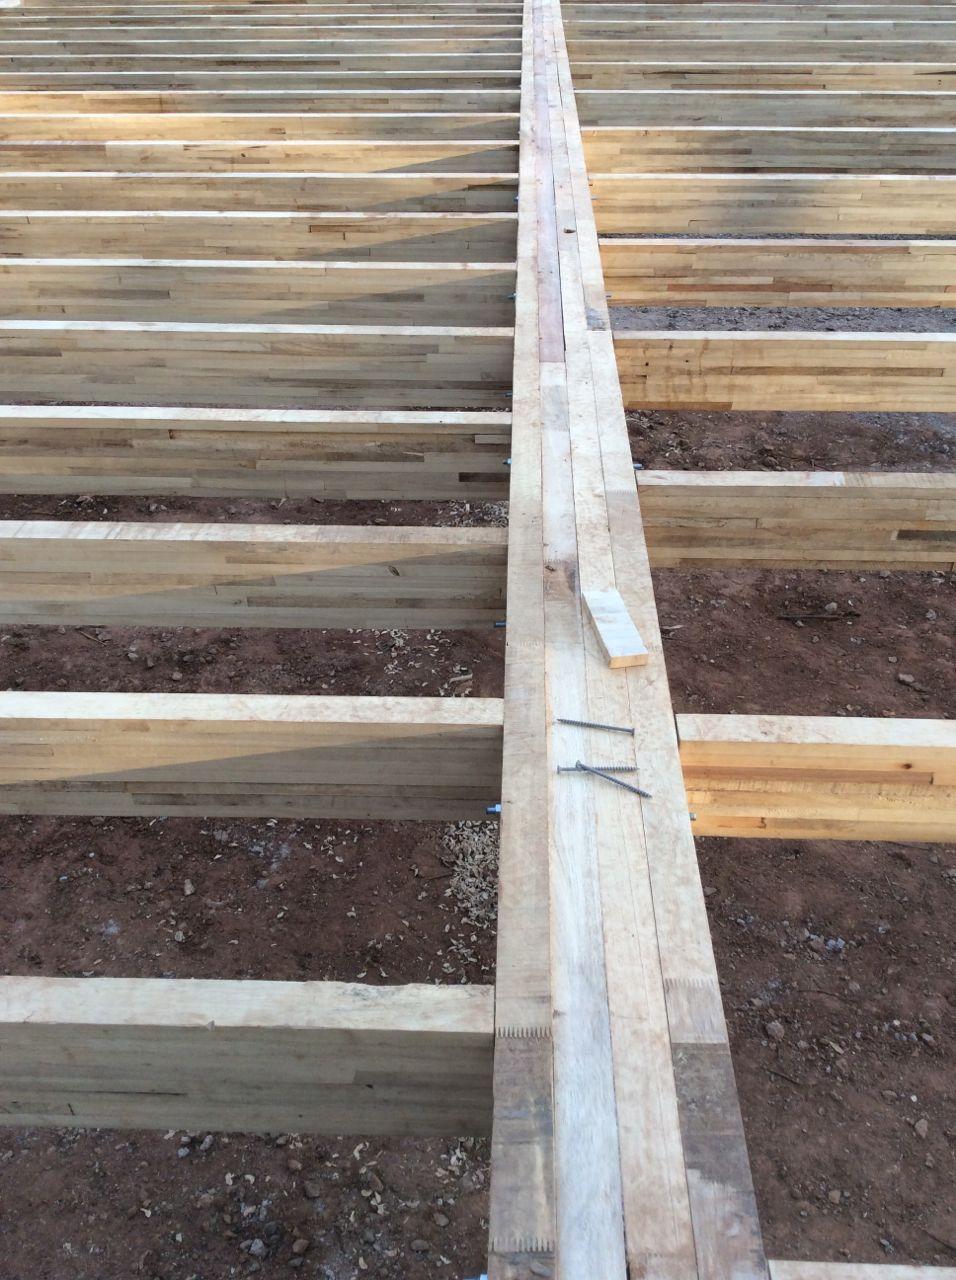 4 ply beam at deck